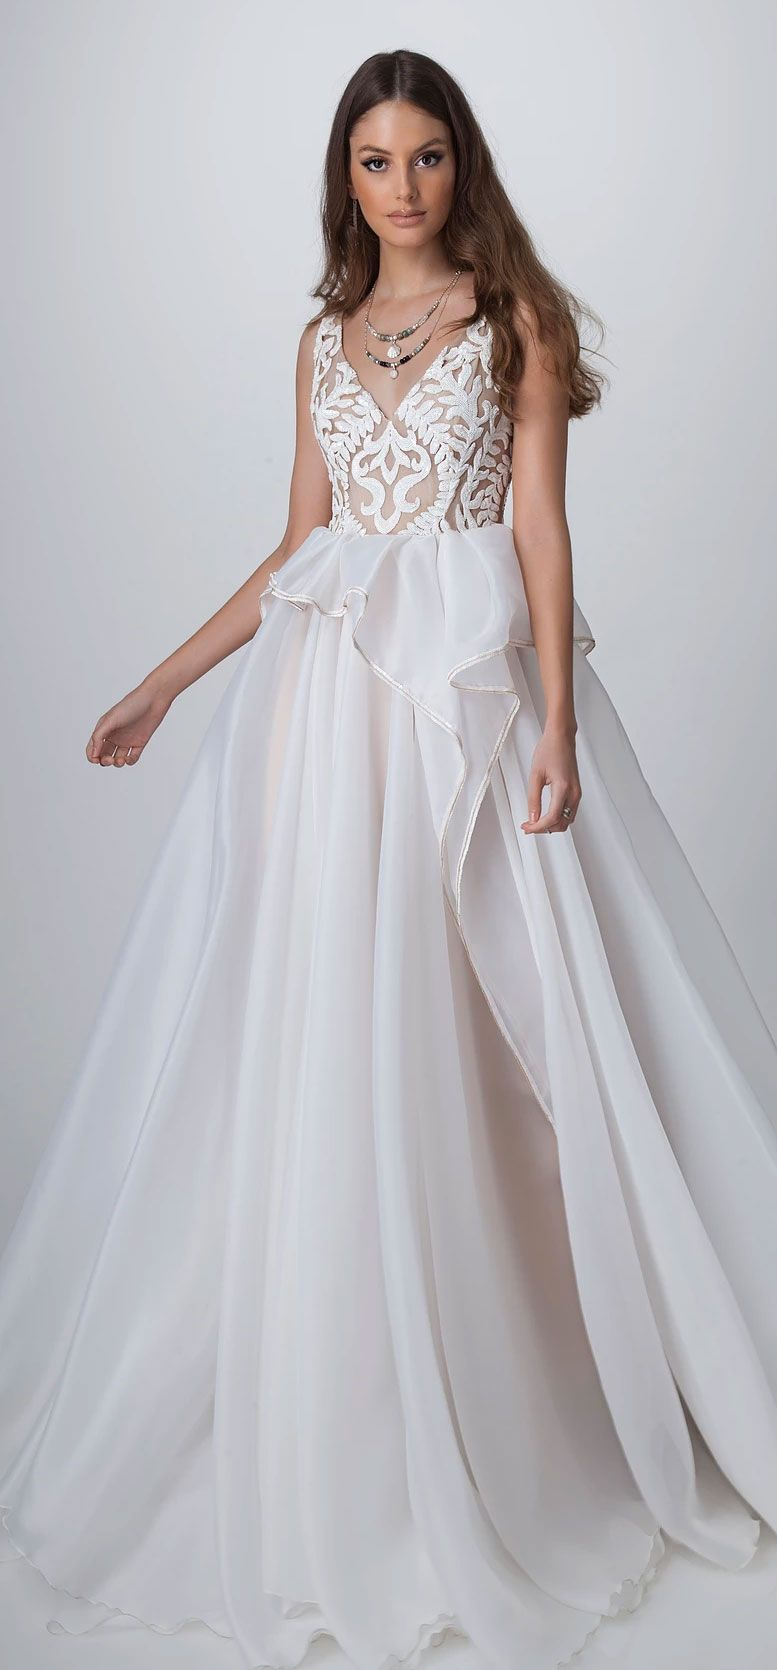 Dreamy boho chic wedding dresses